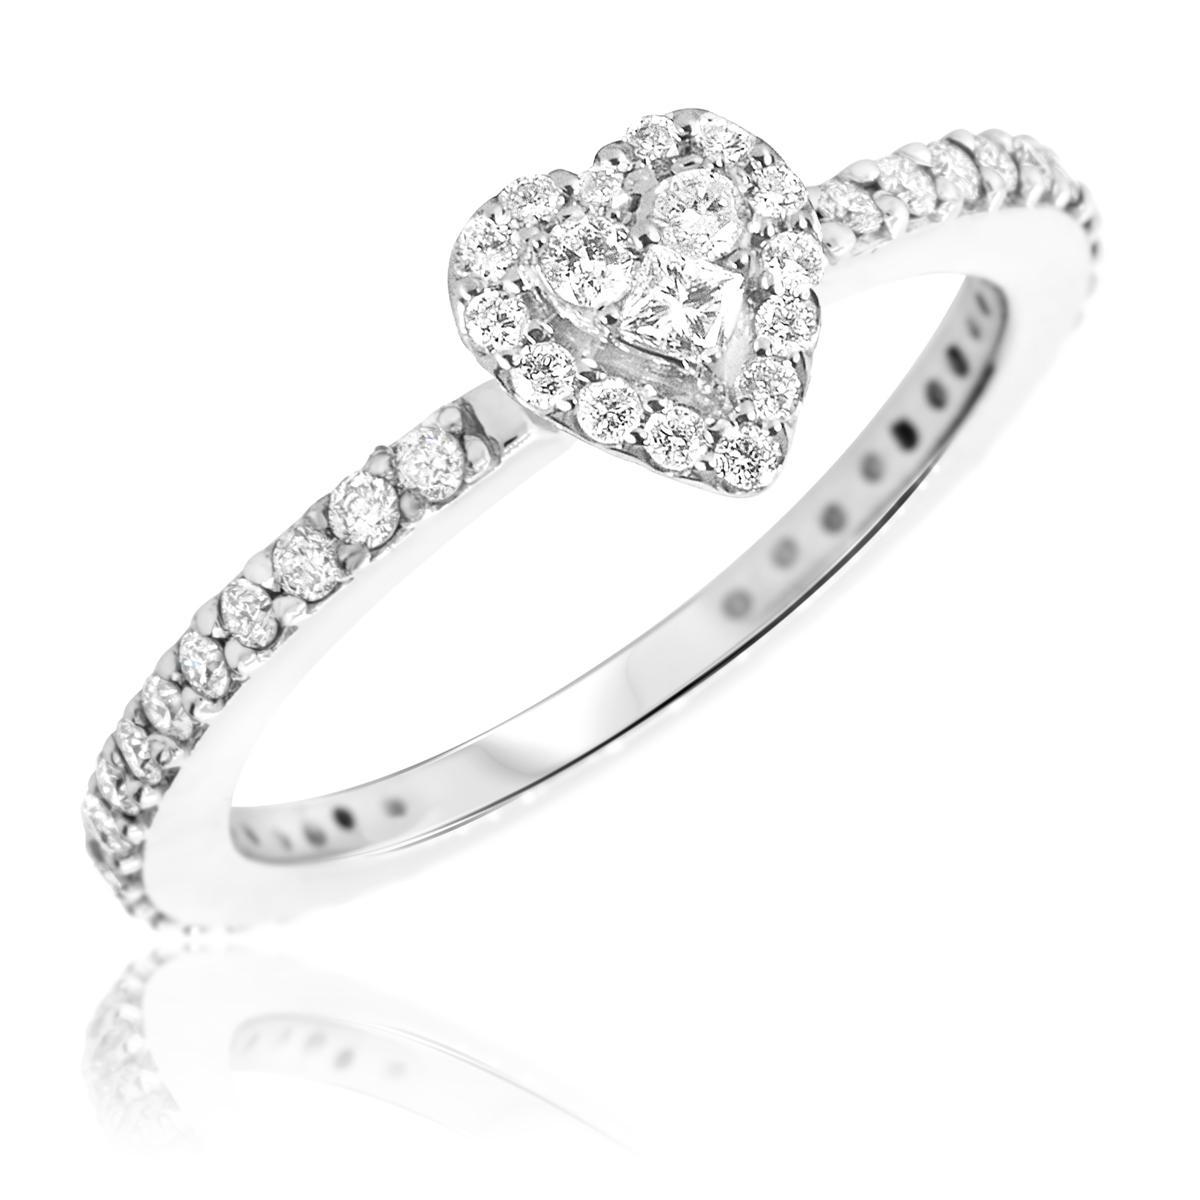 1/2 CT. T.W. Diamond Ladies Engagement Ring 14K White Gold- Size 8